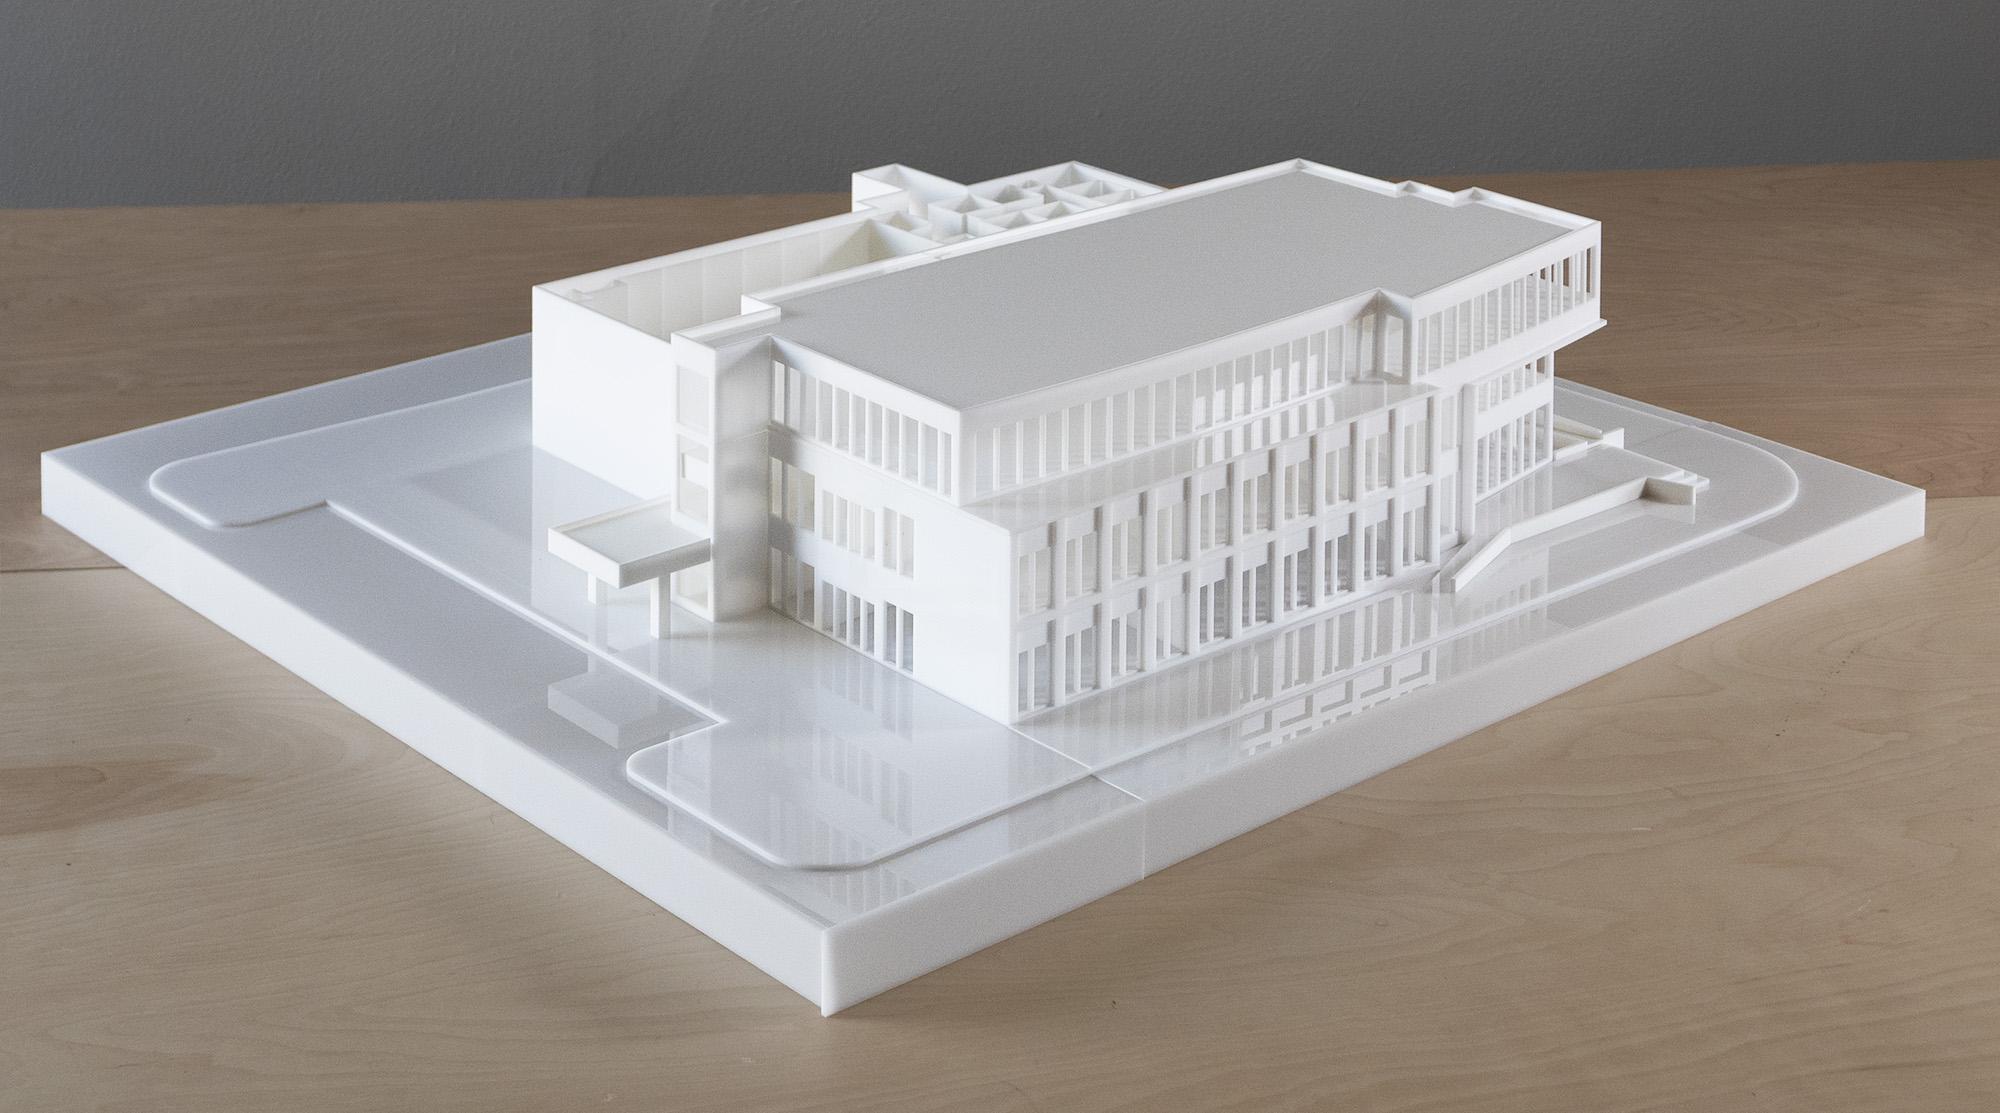 plexi-hospital-site-model.jpg